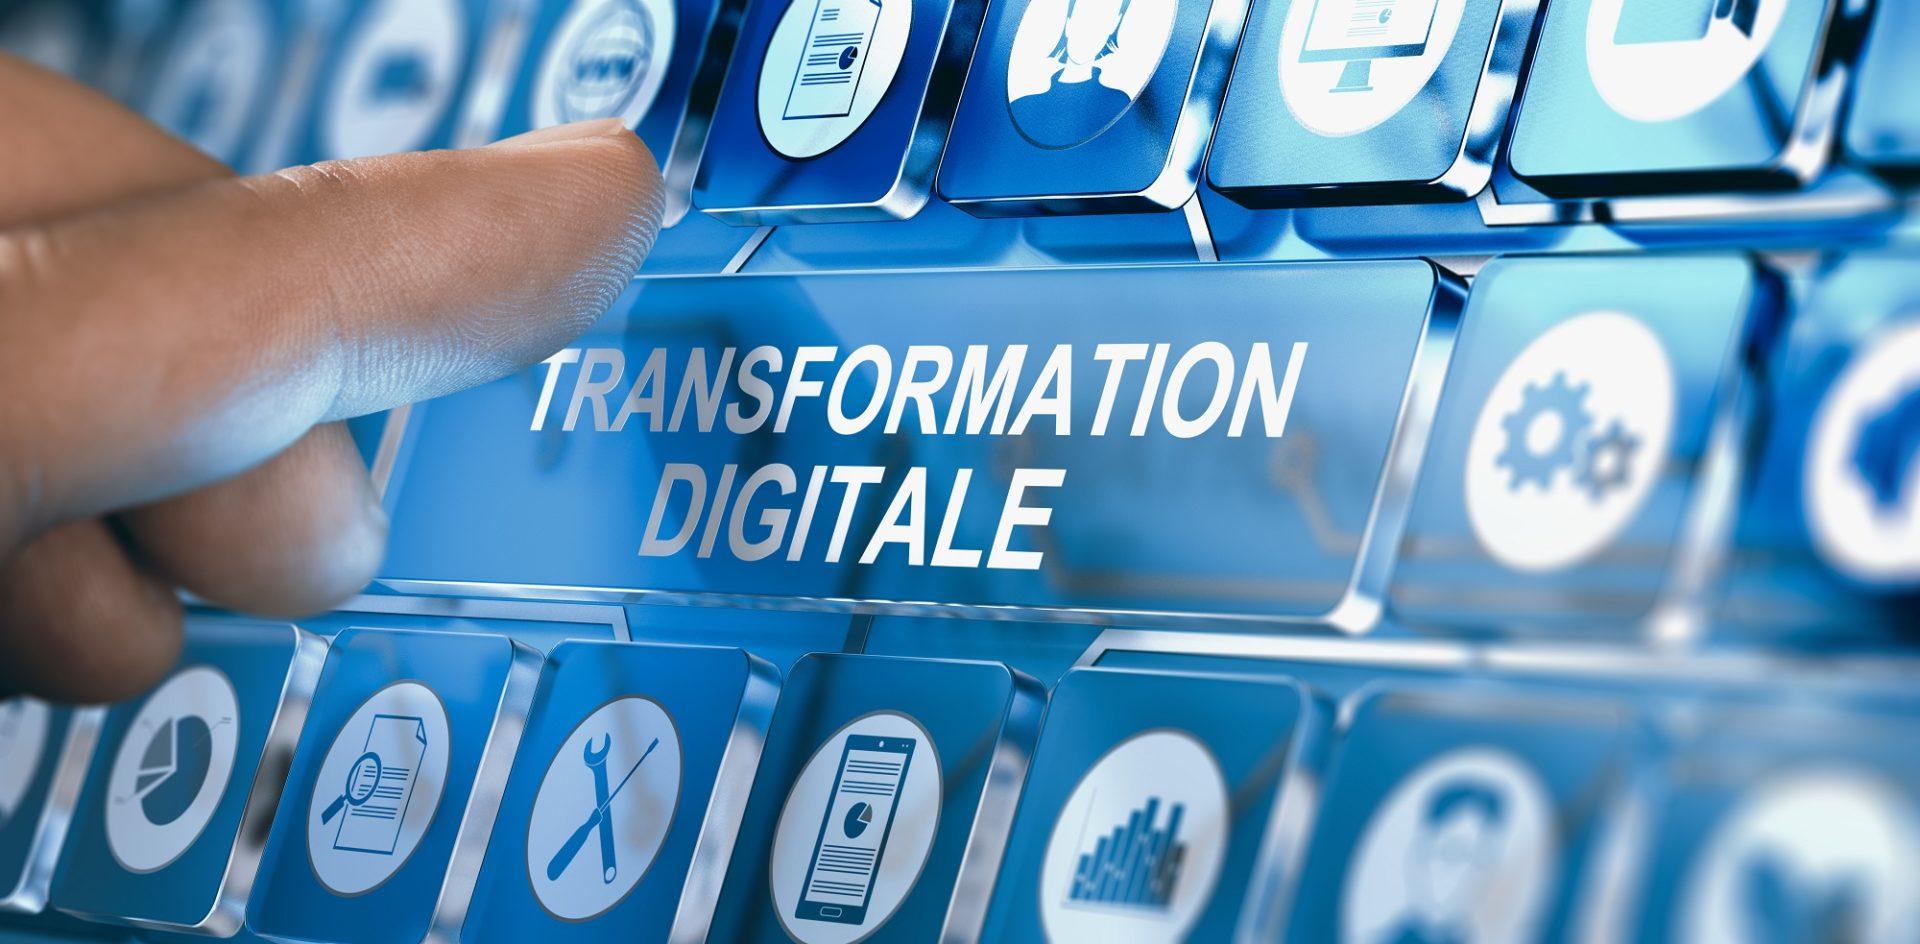 Cabinet de conseil en transformation digitale